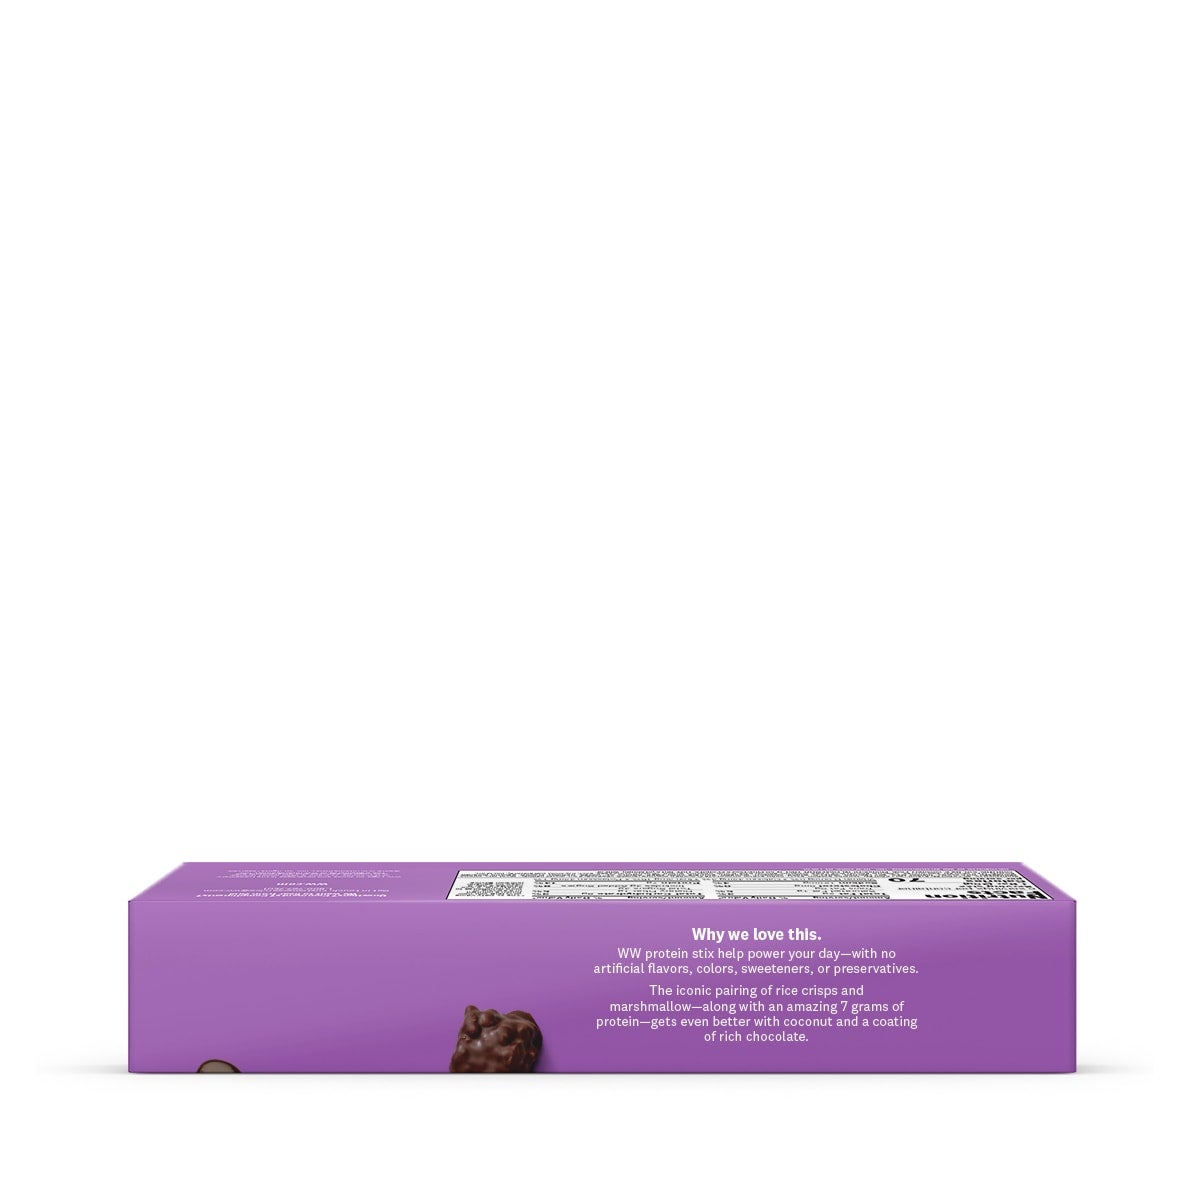 Chocolate Protein Stix - side of box 2